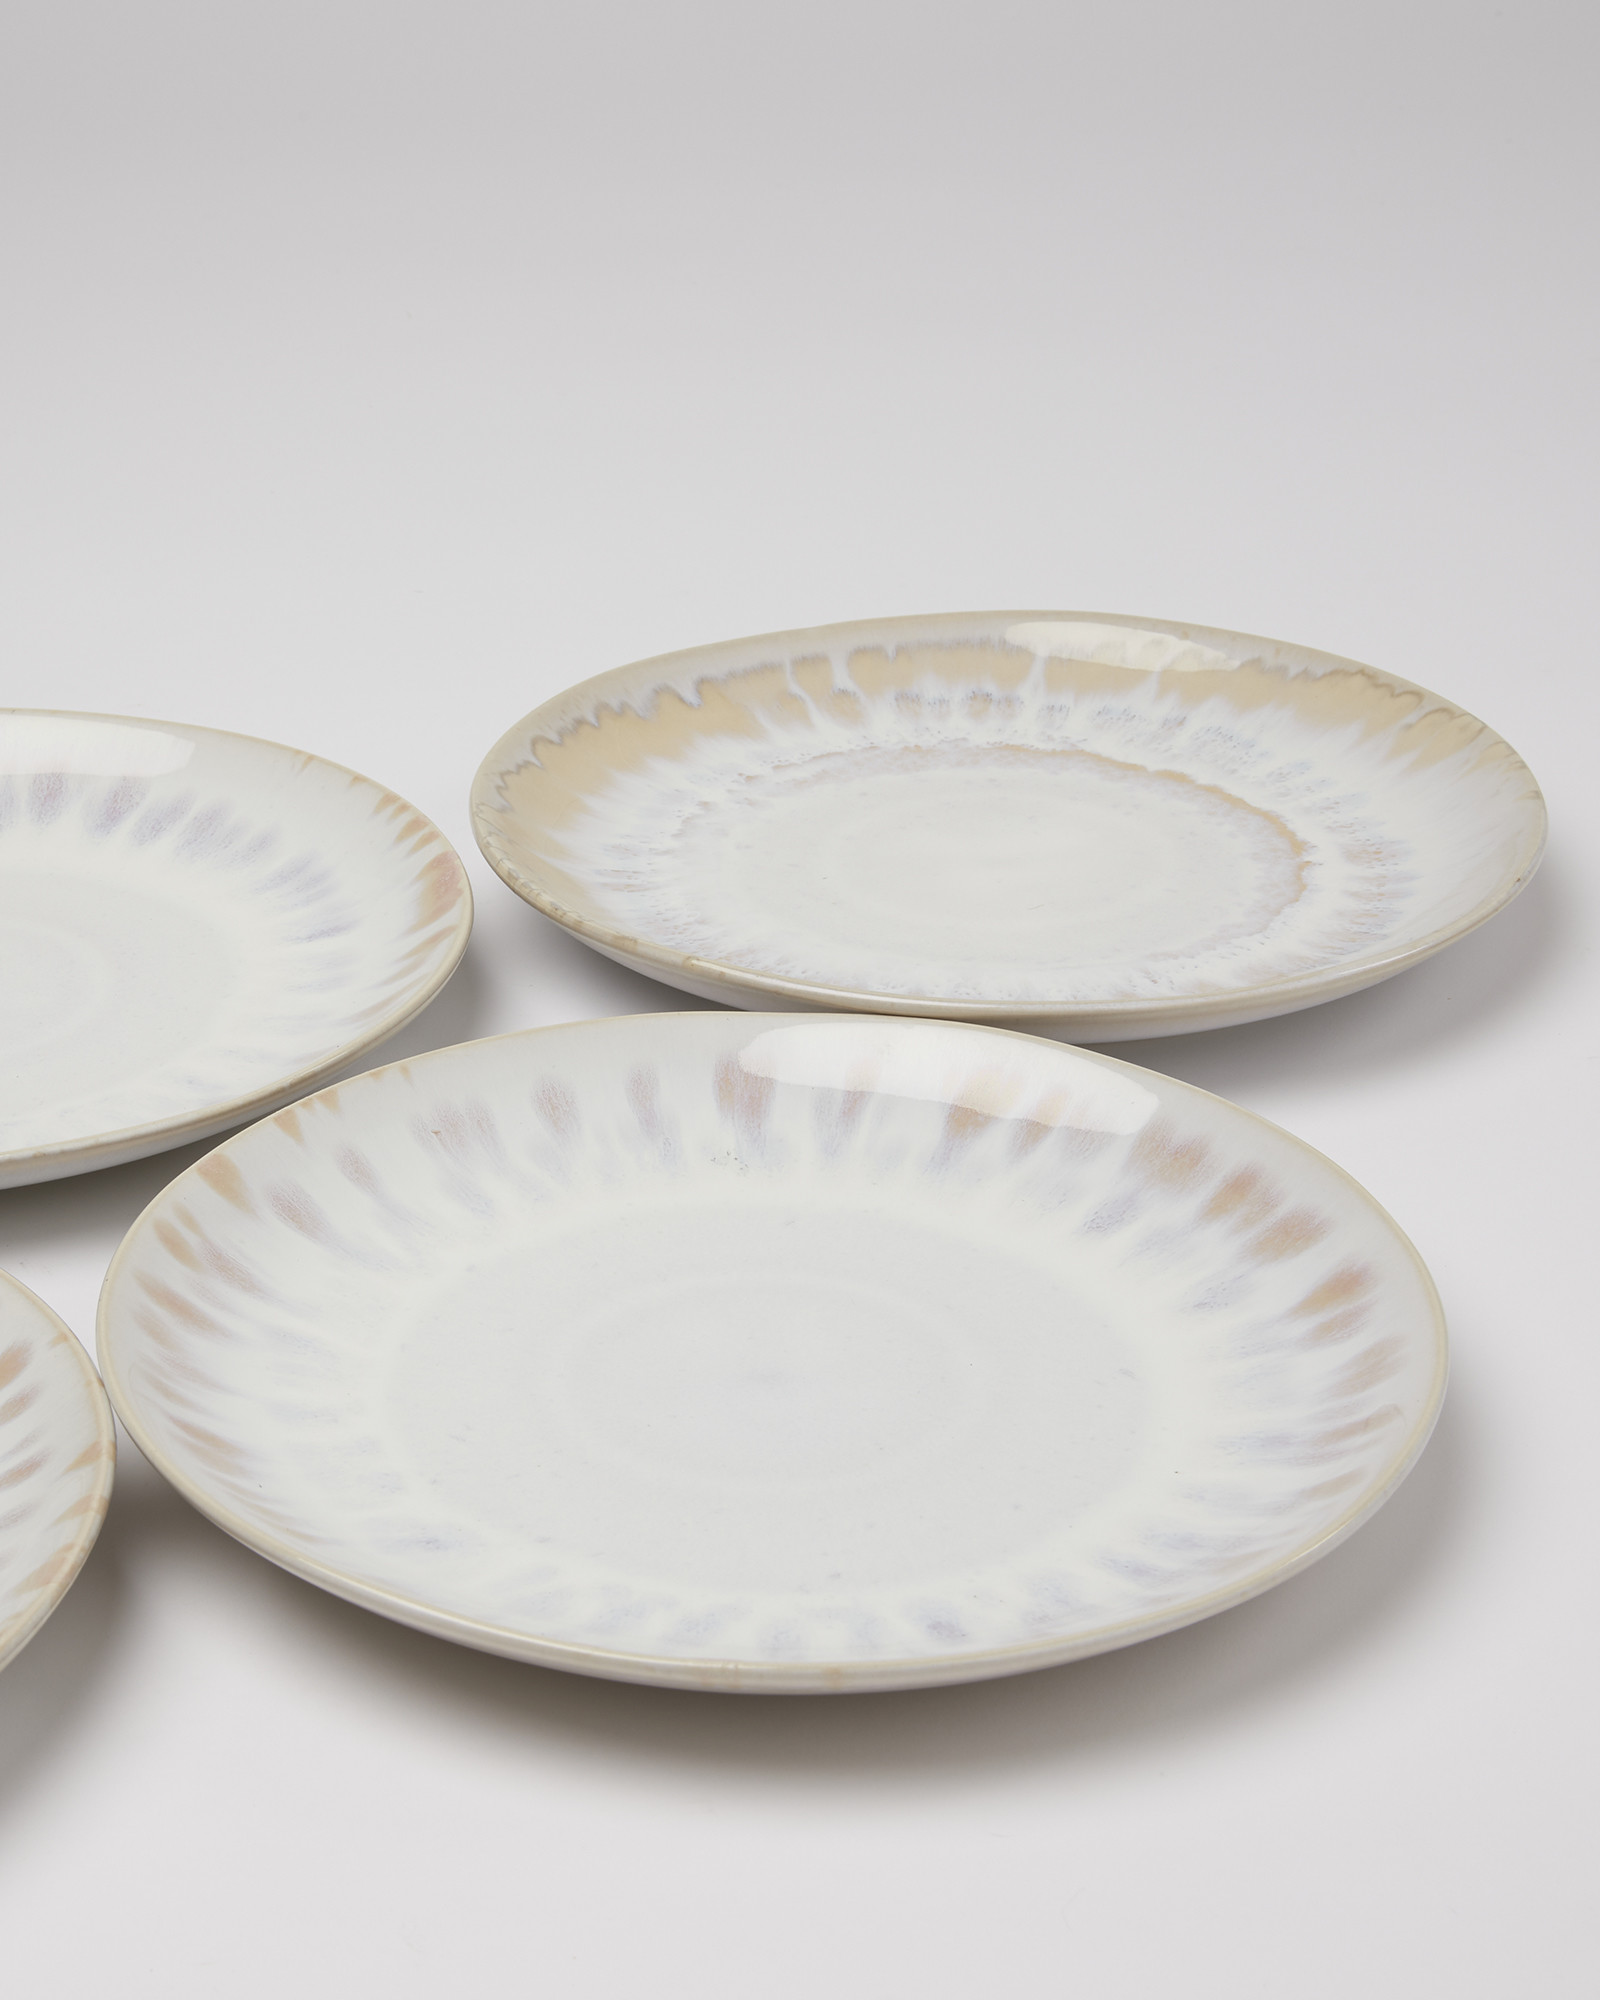 Muana White Reactive Glazed Stoneware Dinner Plates Set Of Four Oliver Bonas Ie